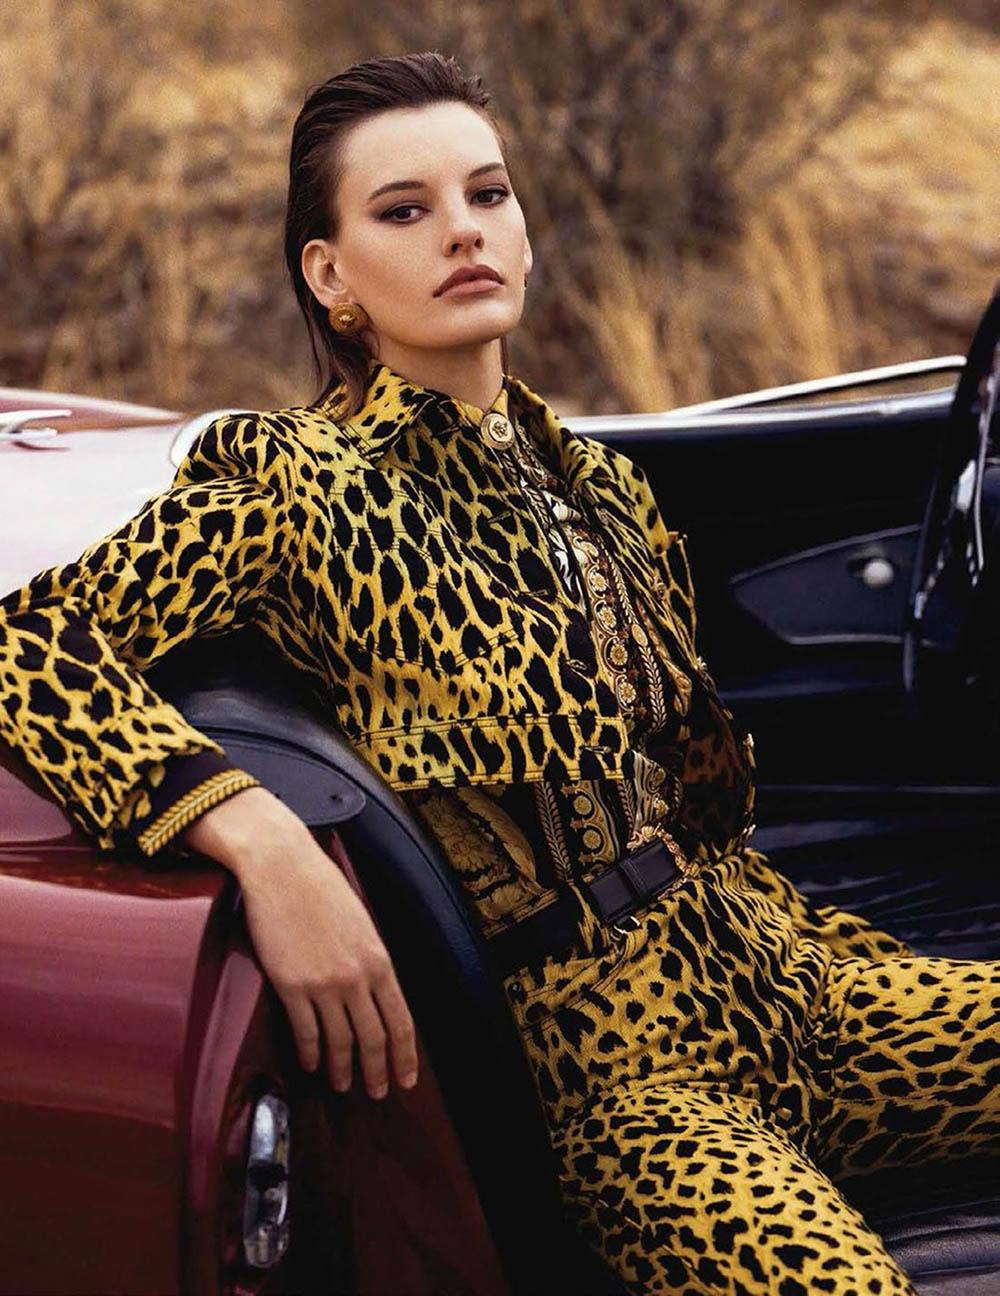 Amanda Murphy by Bjorn Iooss for Vogue Spain April 2018